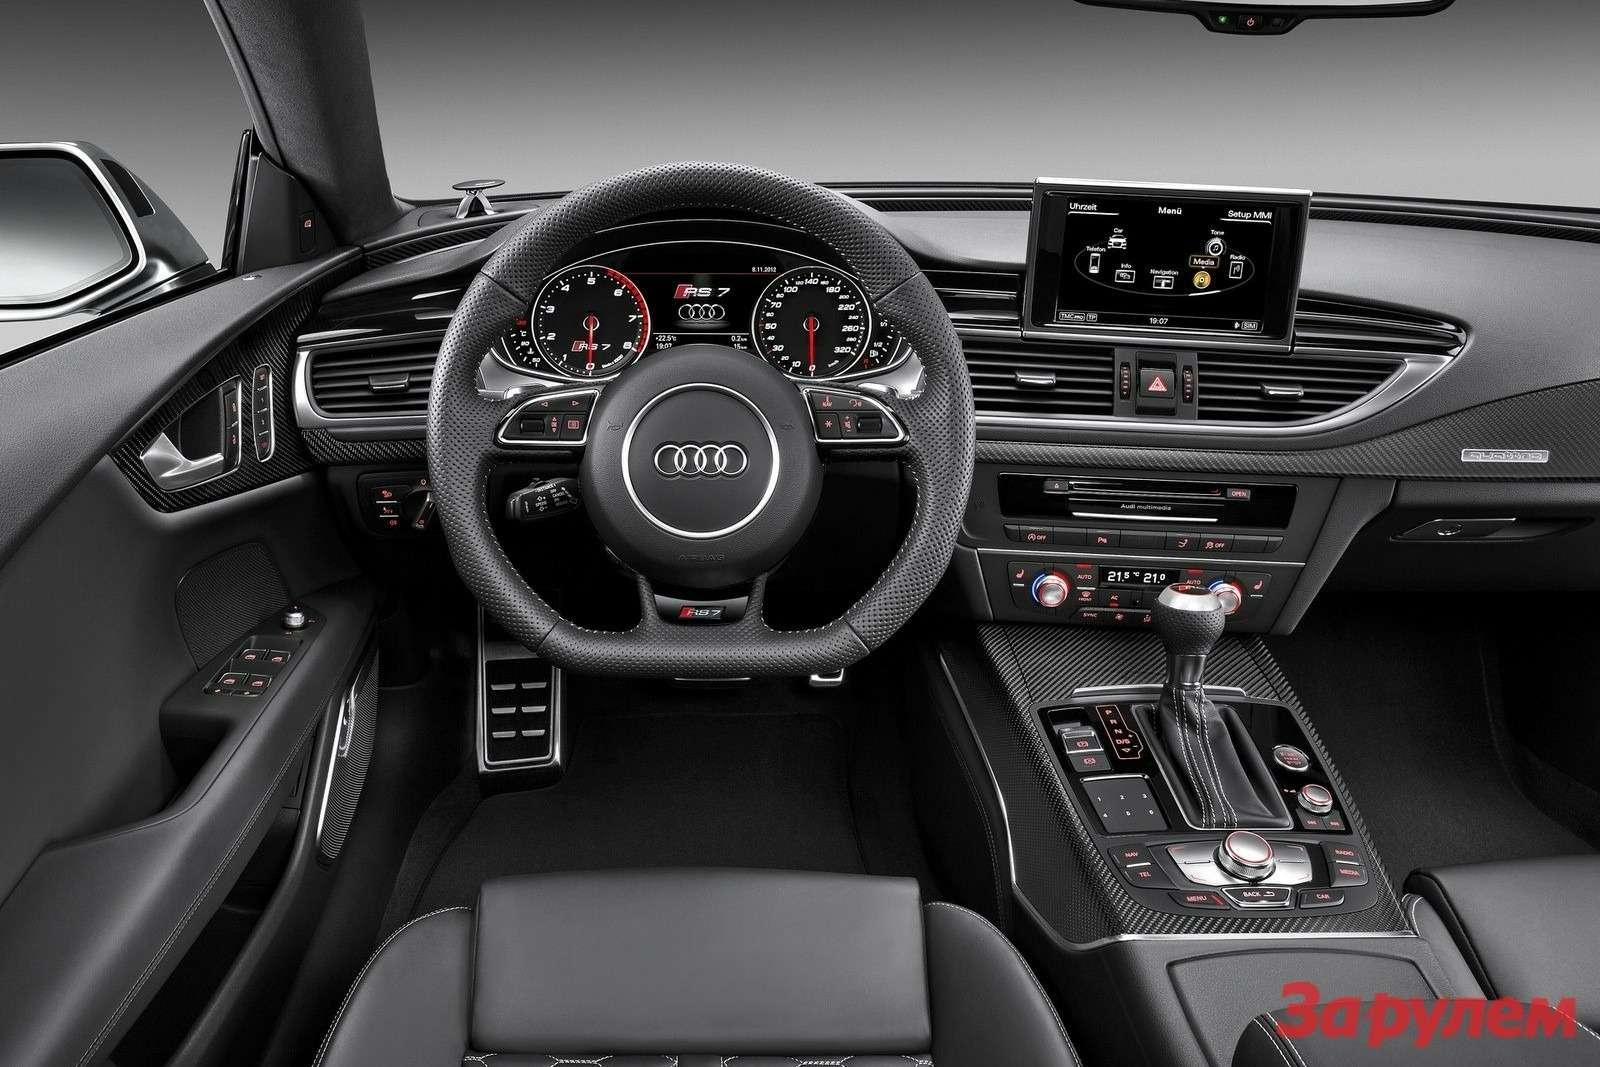 Audi-RS7_Sportback_2014_1600x1200_wallpaper_0a